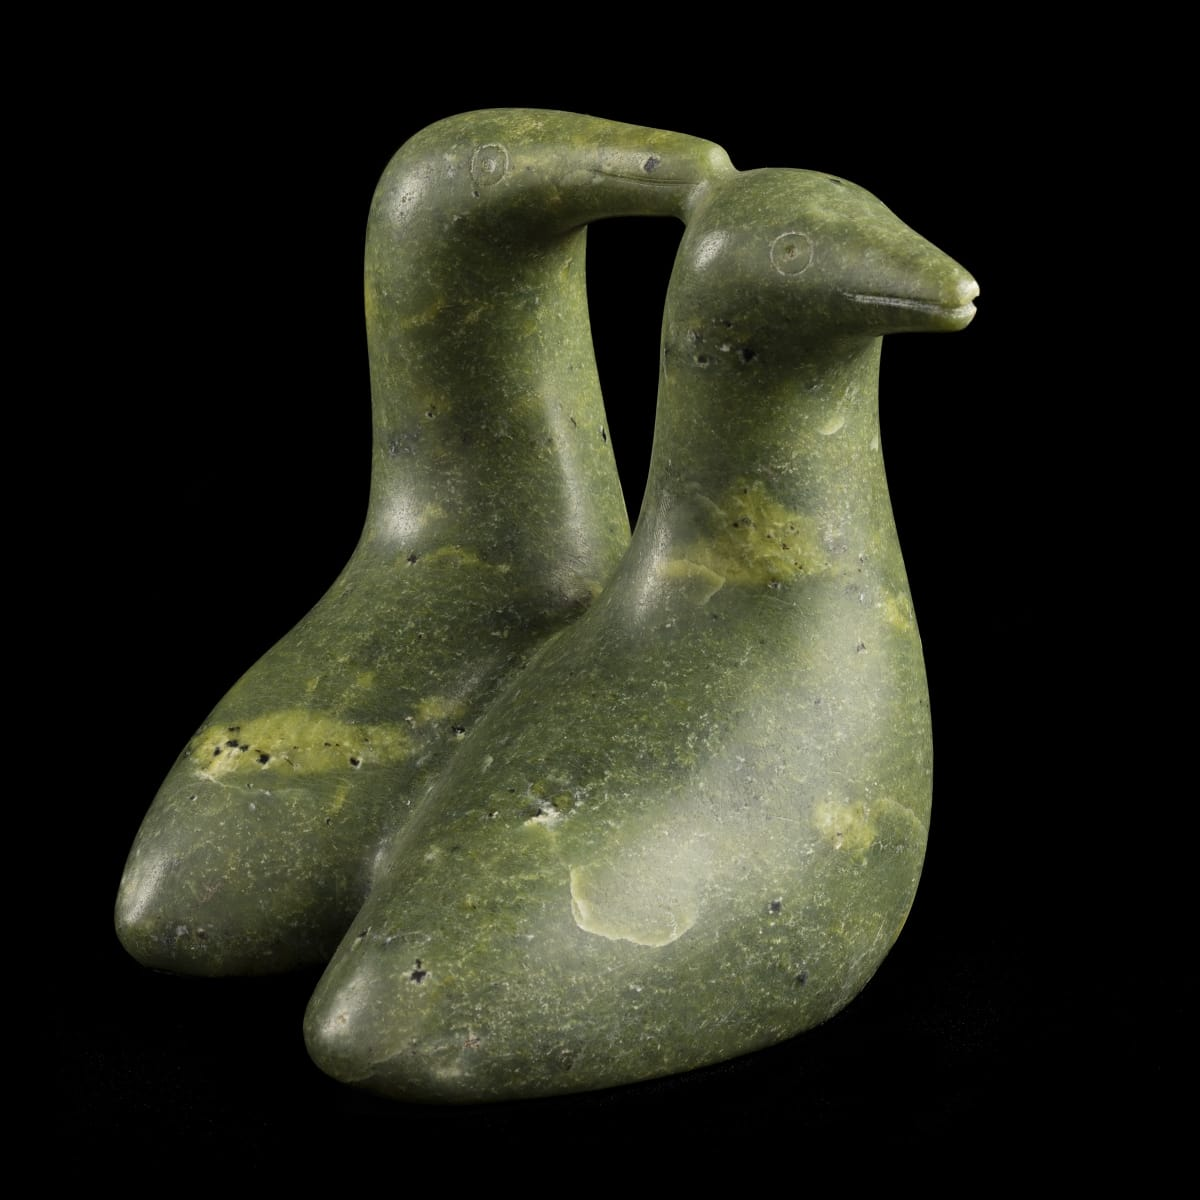 SHARKY NUNA (1918-1979) KINNGAIT (CAPE DORSET) Bird Couple REALIZED: $1,440